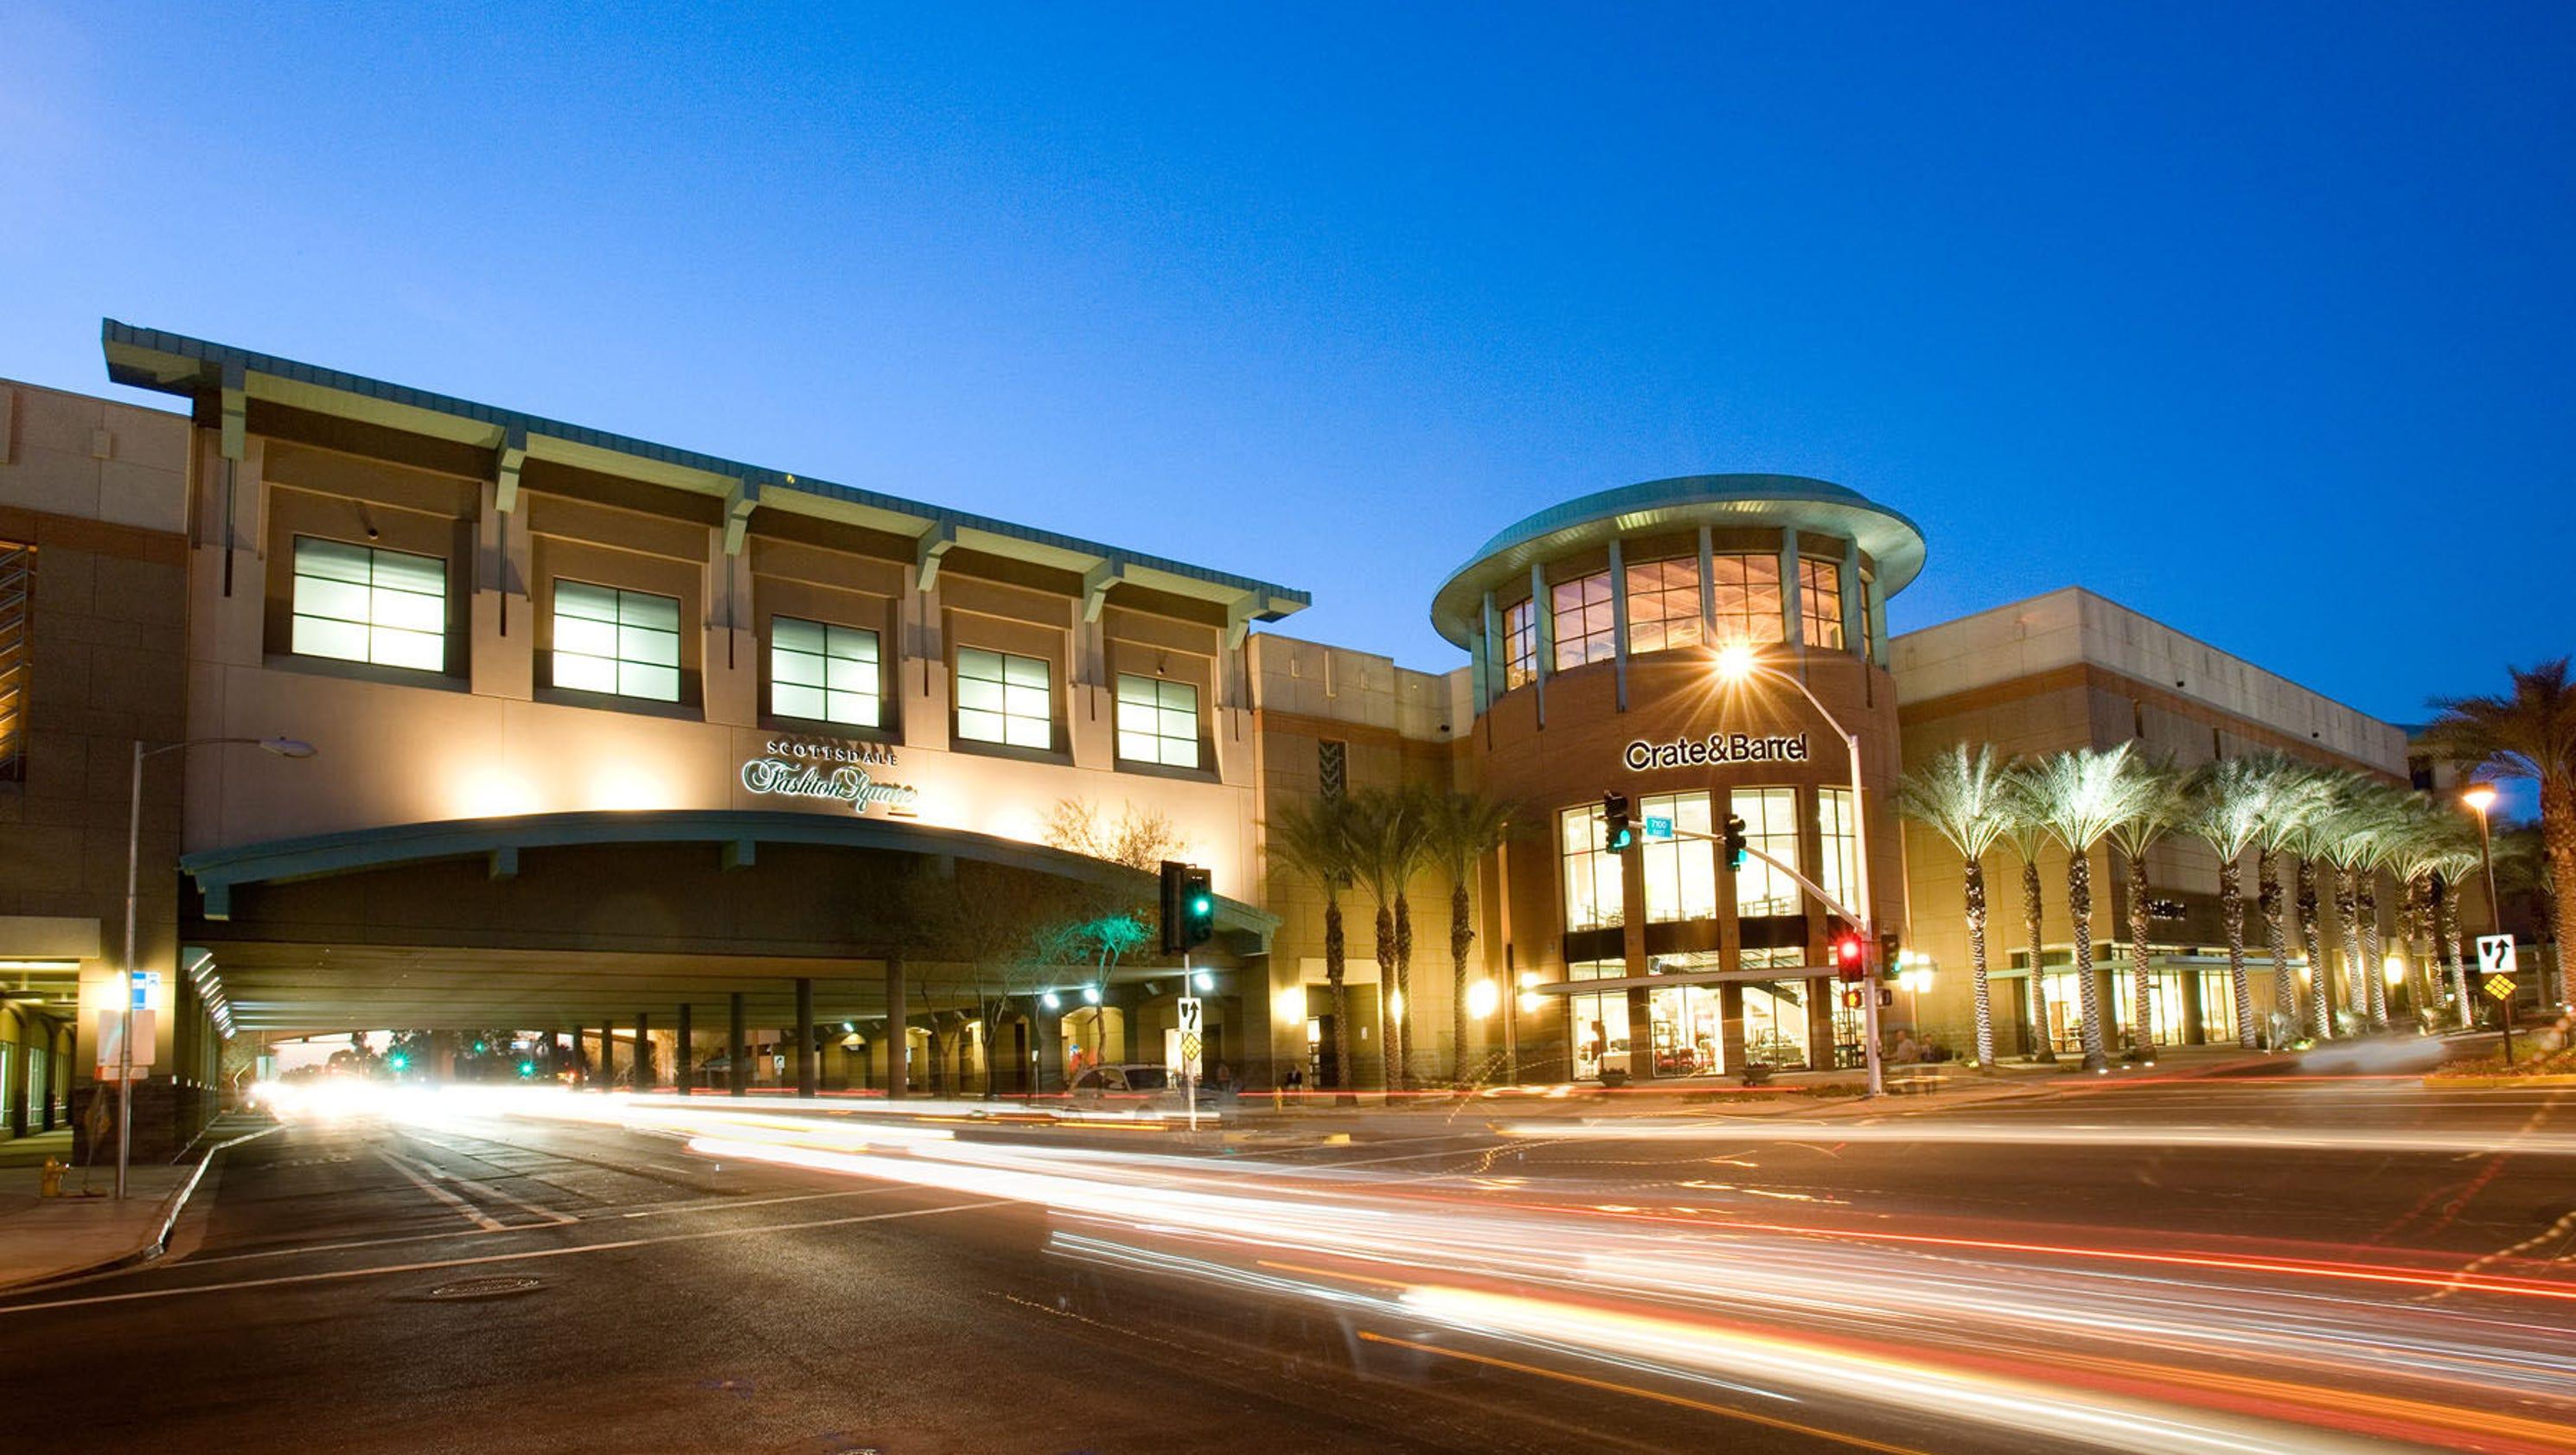 5 New Stores At Scottsdale Fashion Square